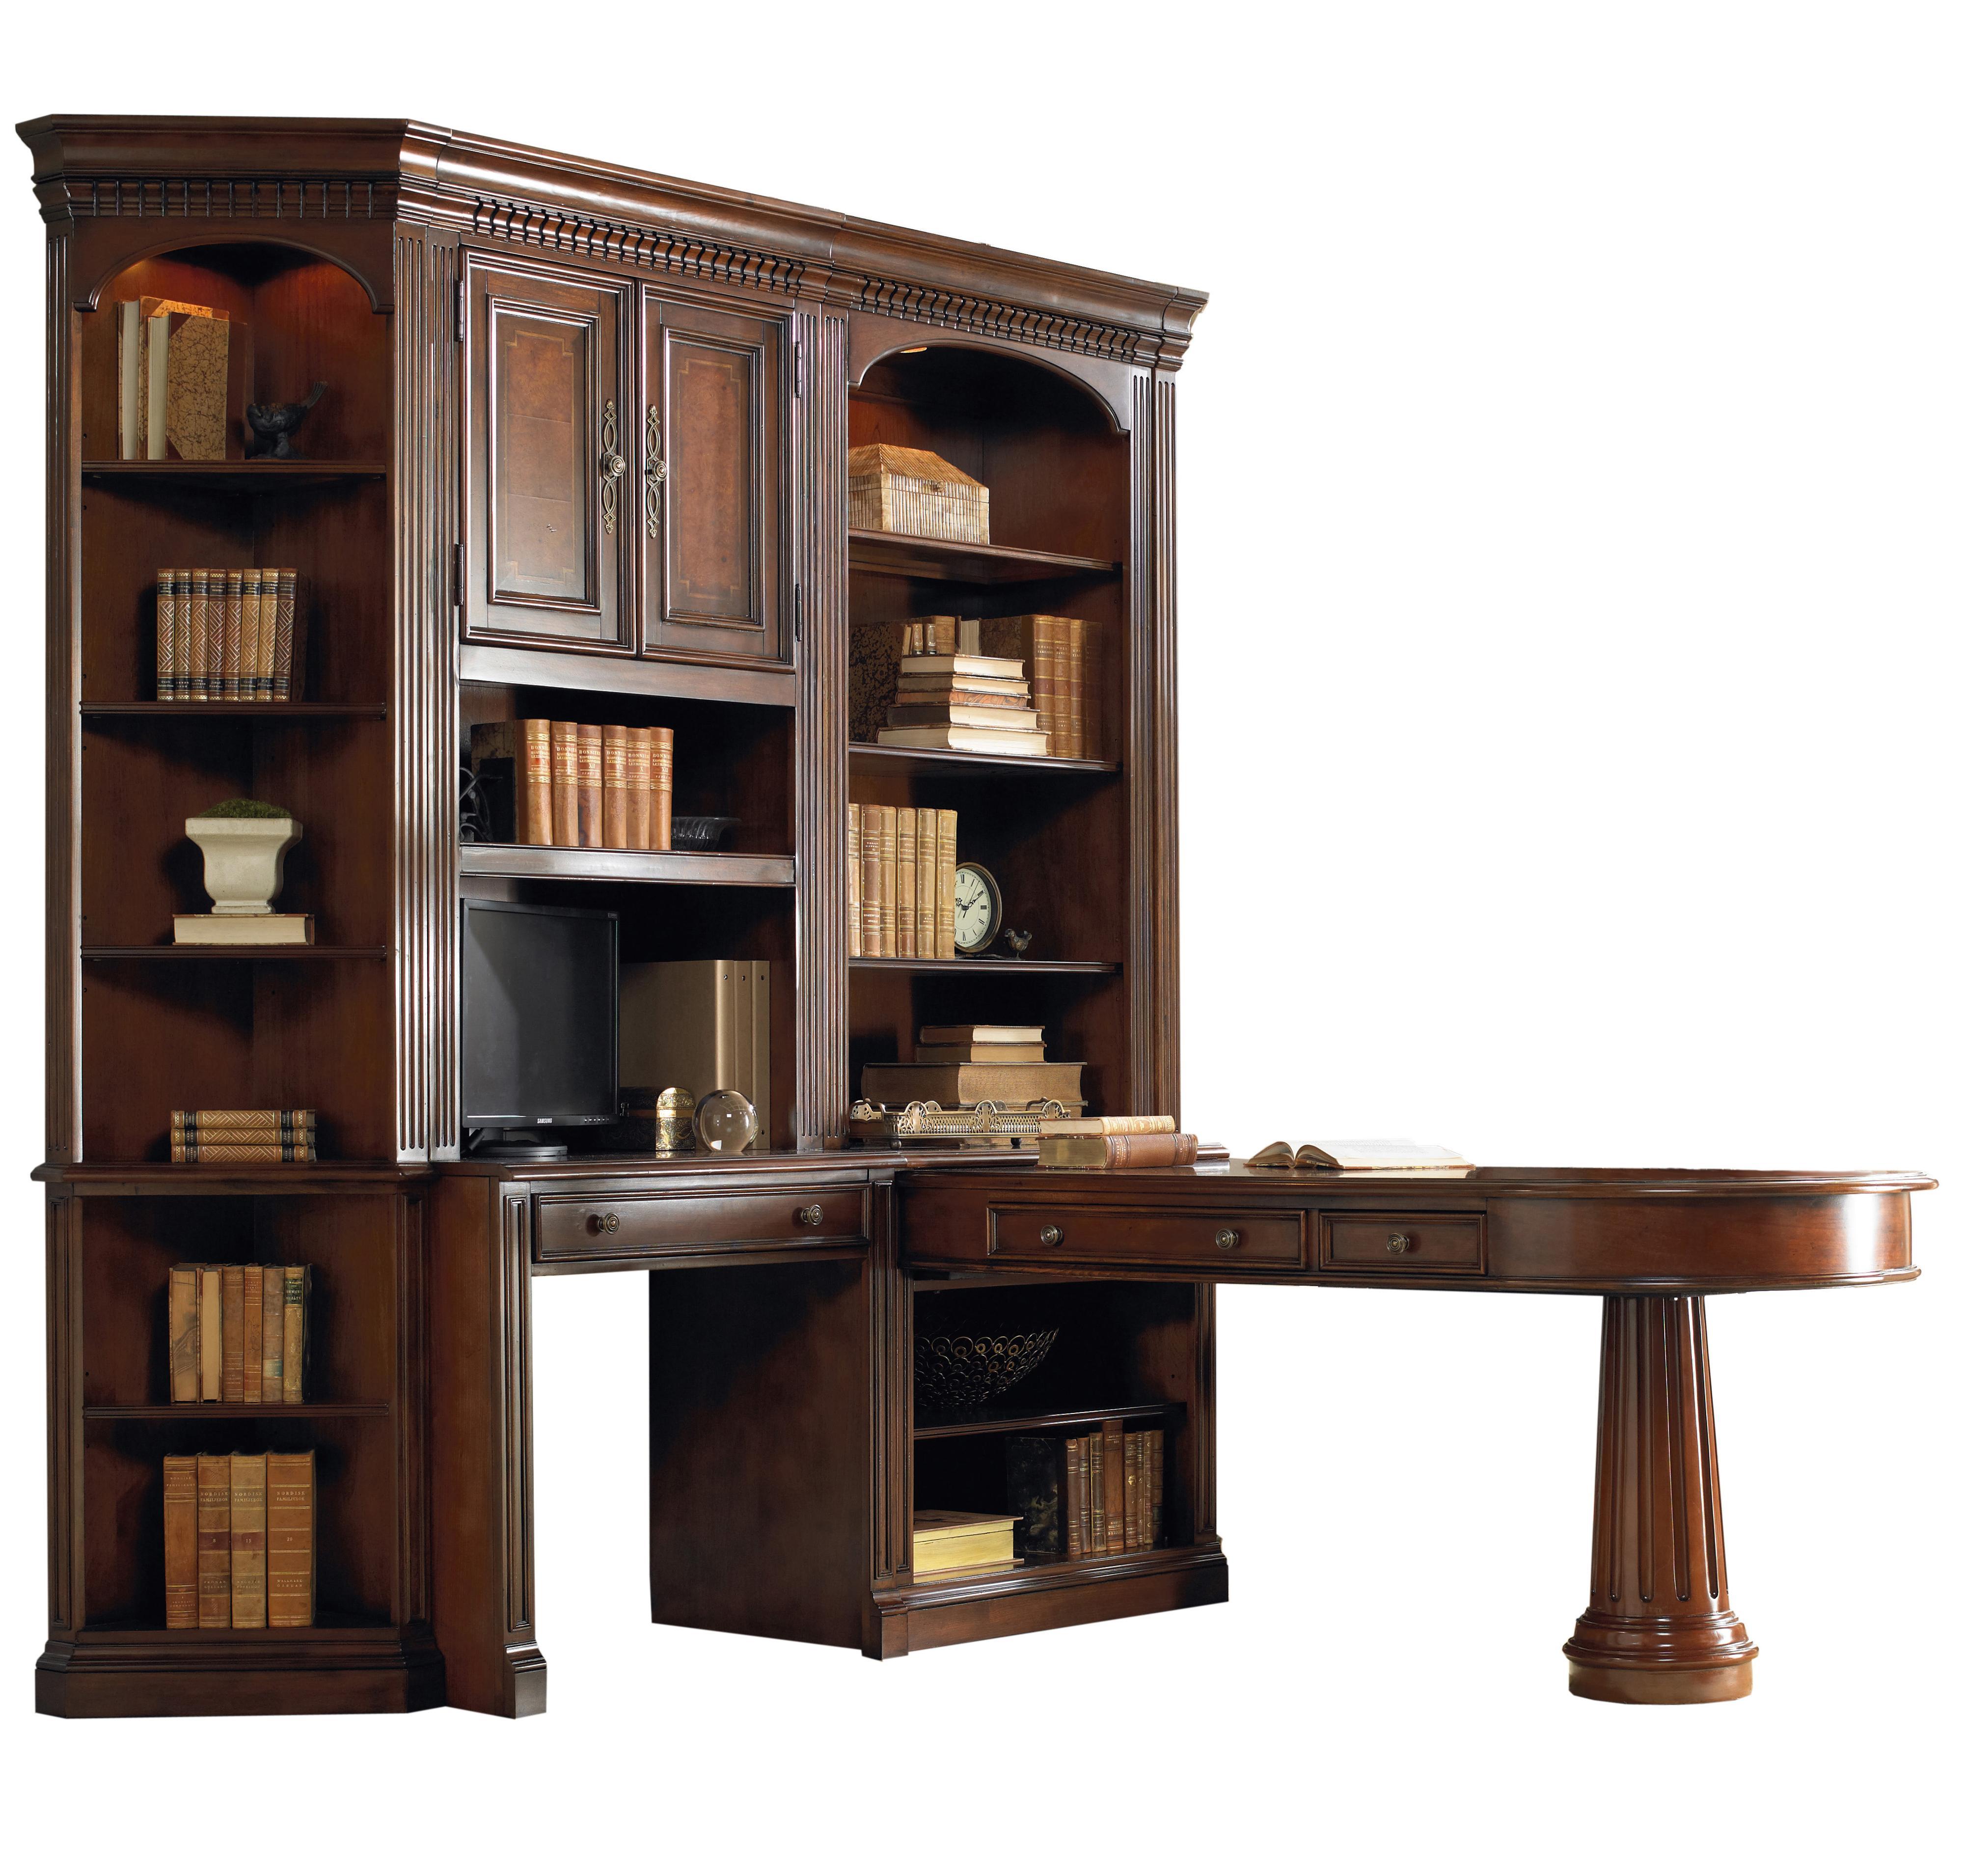 Hooker furniture european renaissance ii office wall unit for European furniture